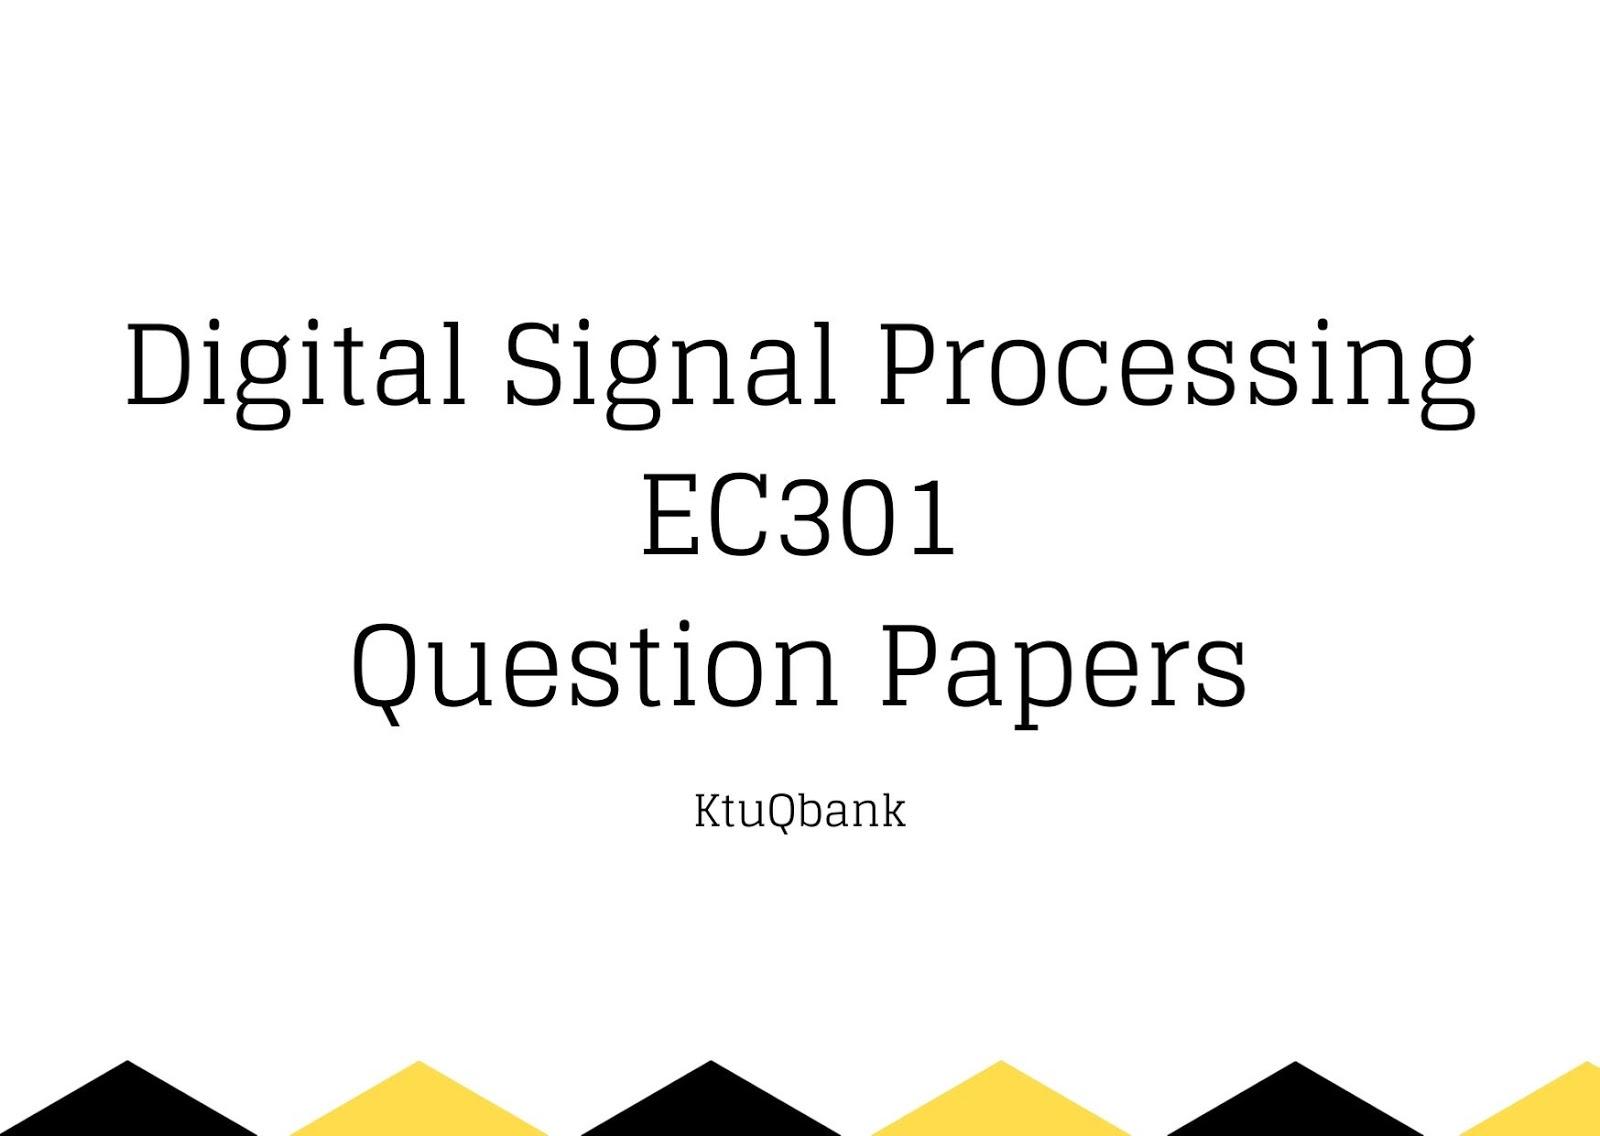 Digital Signal Processing | EC301 | Question Papers (2015 batch)